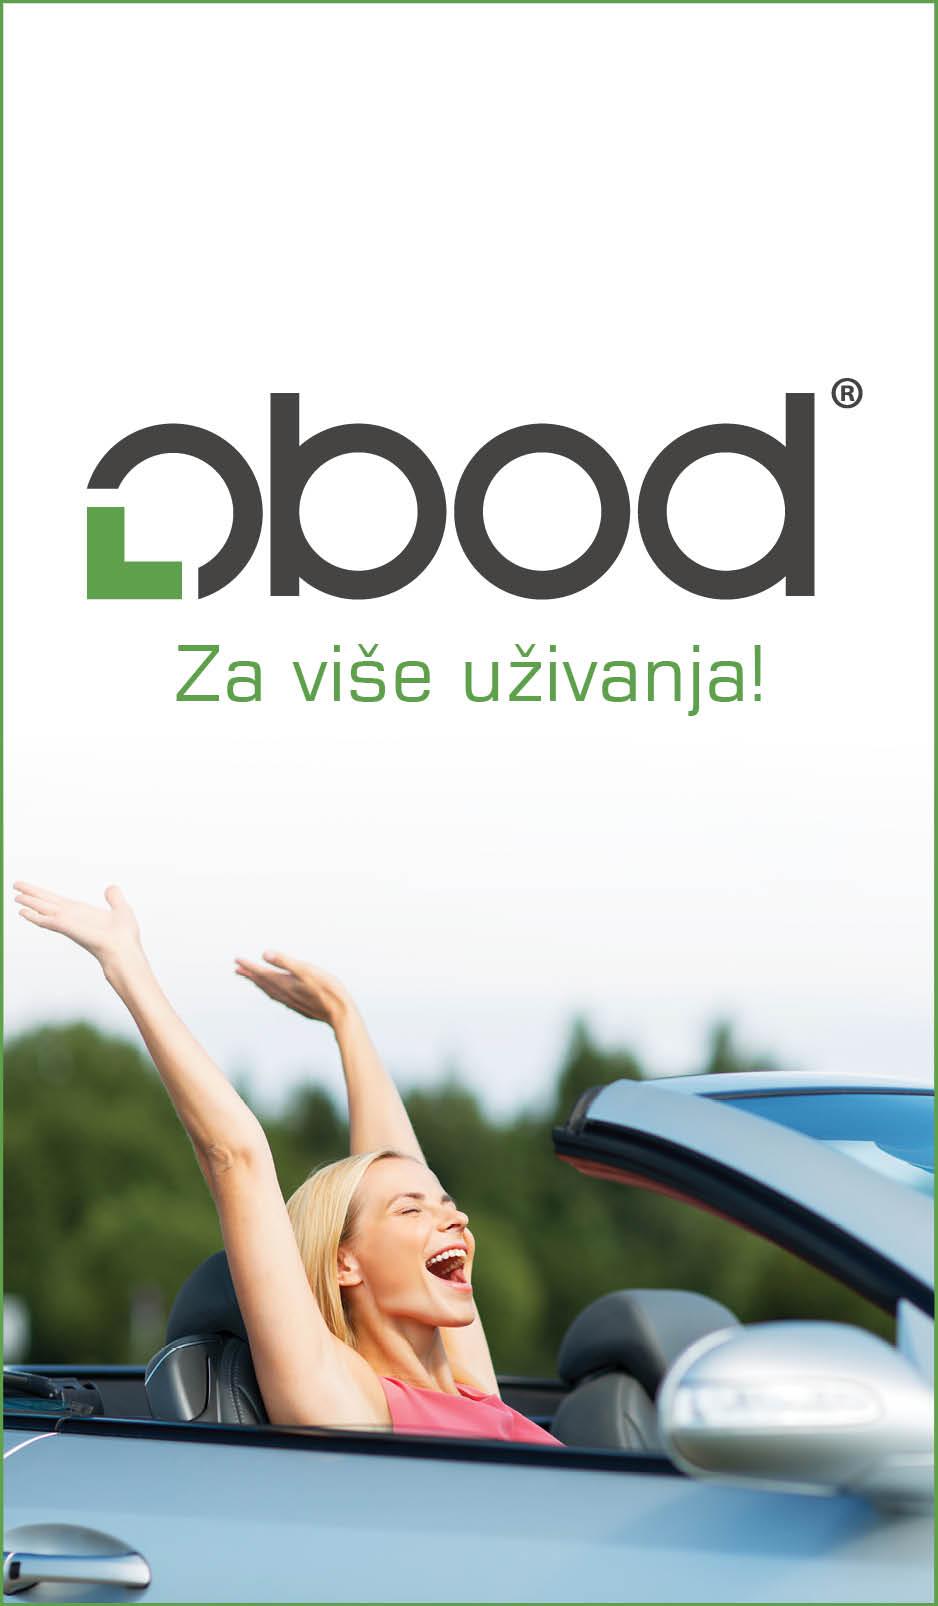 http://lobod.me/